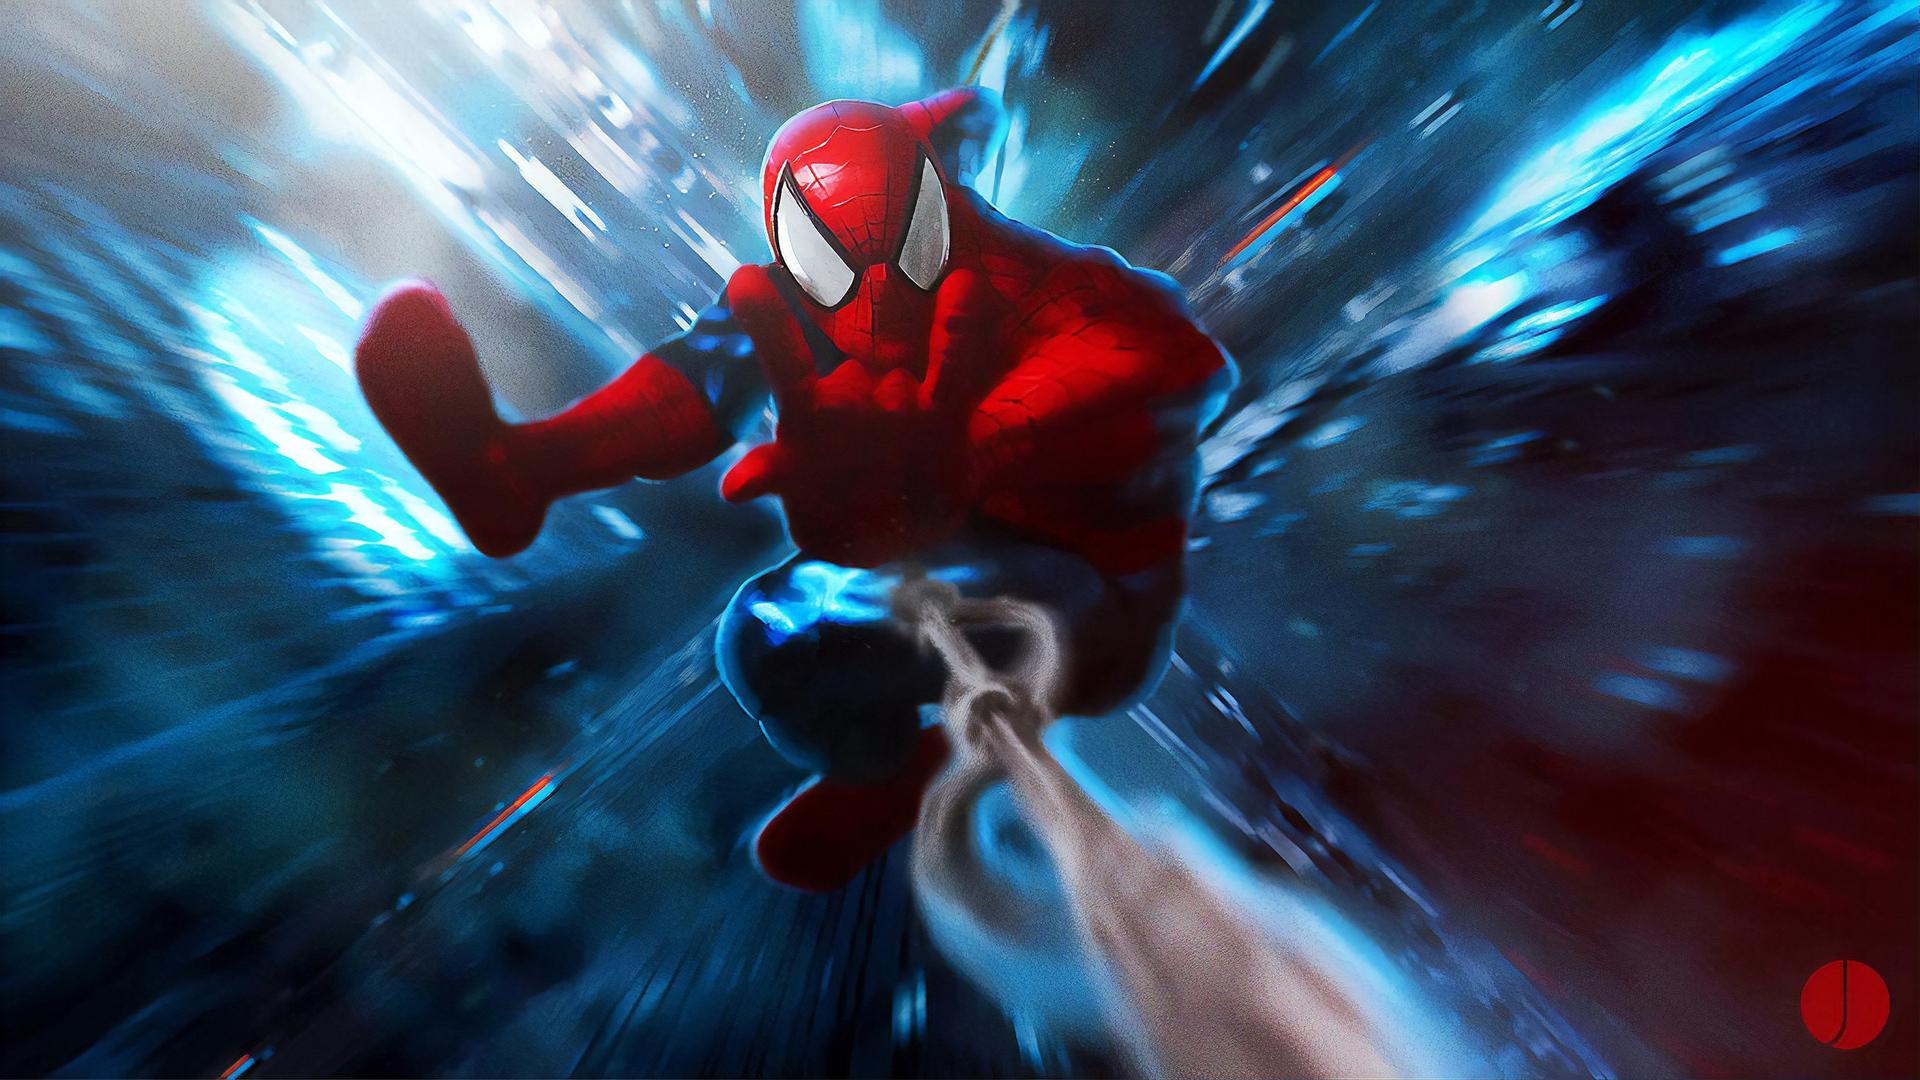 spiderman-coming-art-vg.jpg